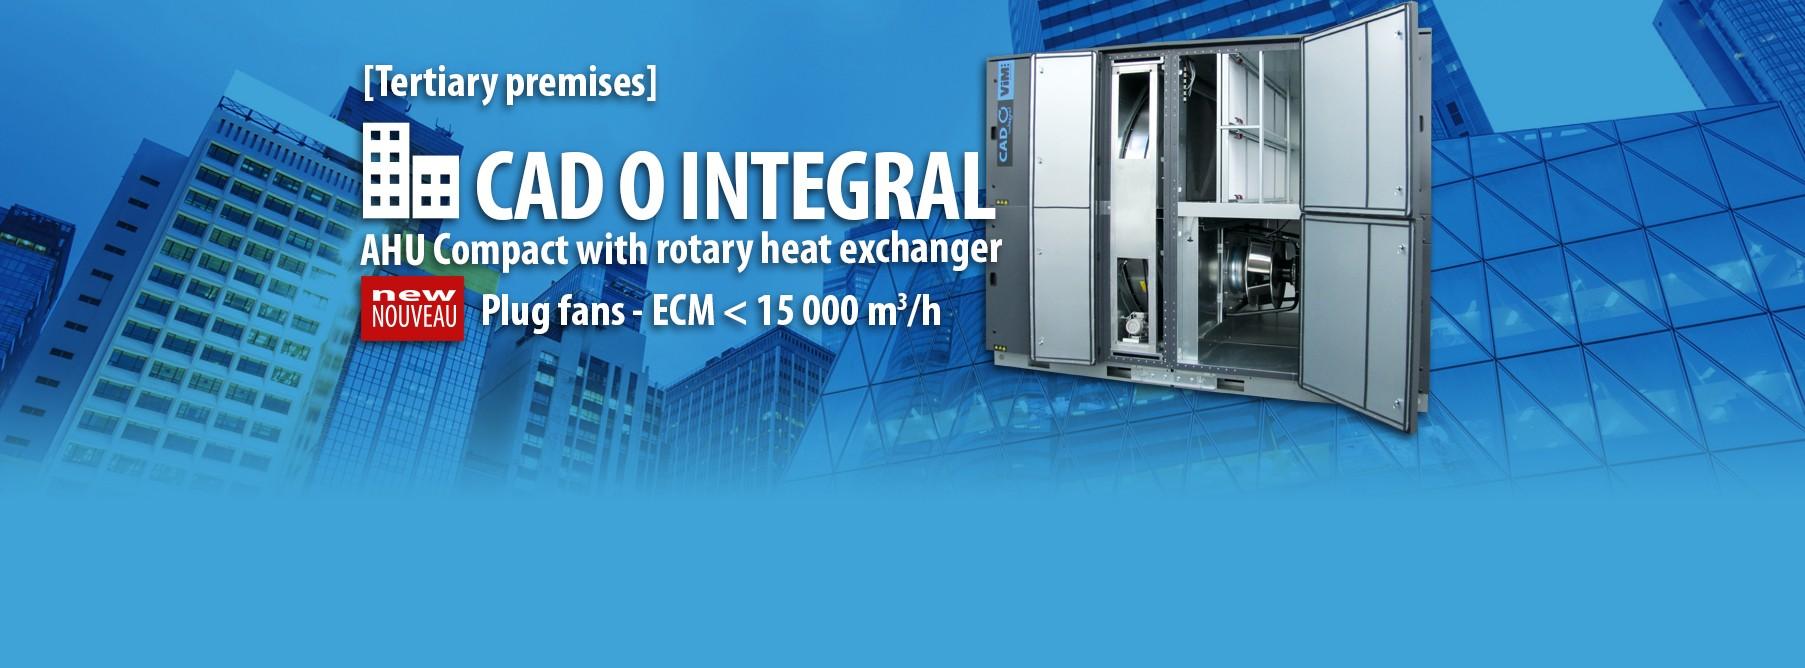 AHU rotary heat exchanger